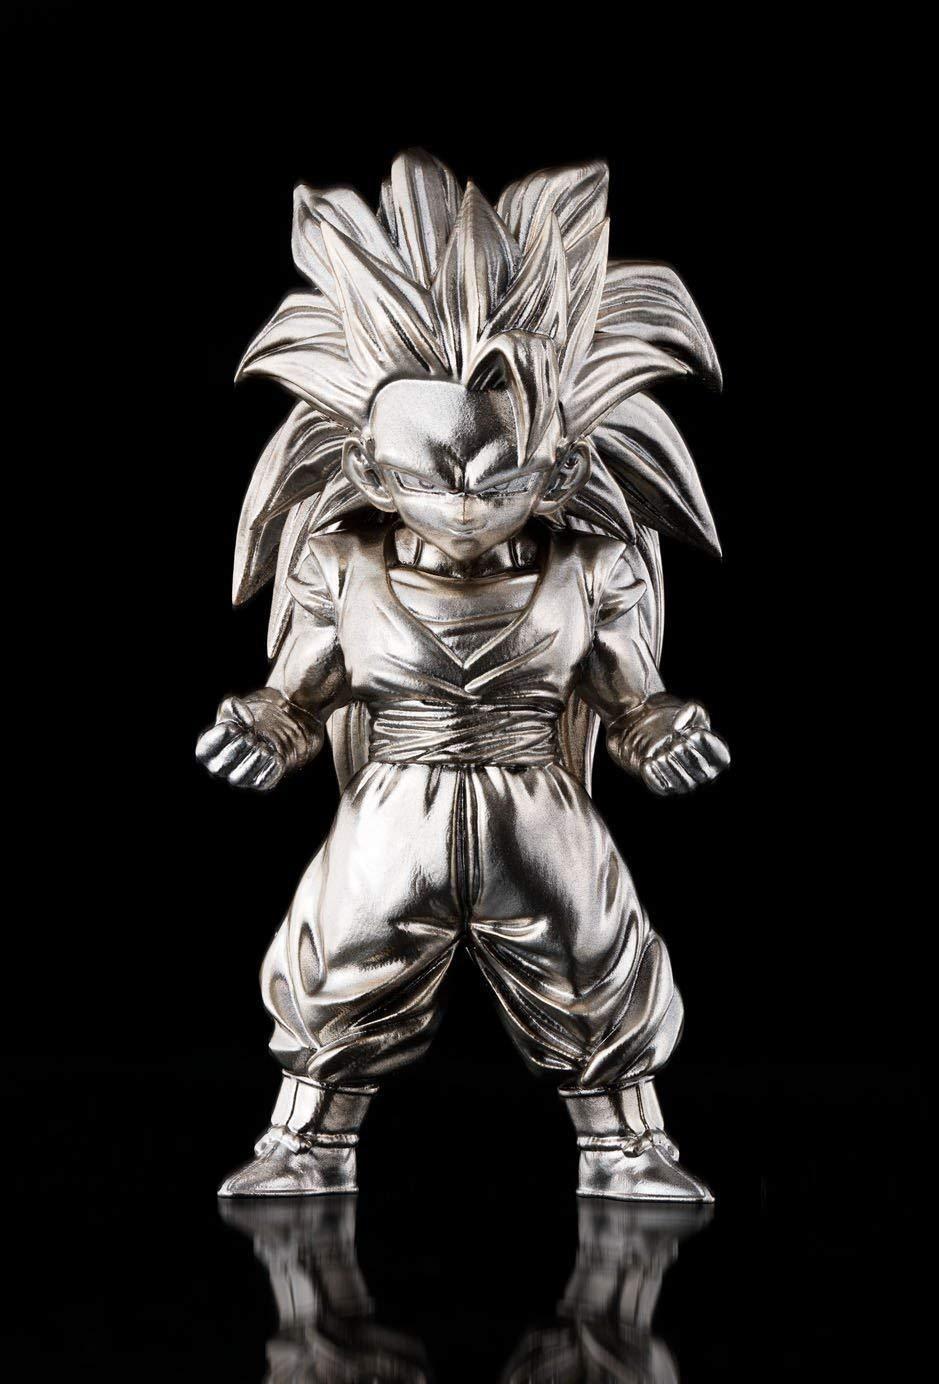 Bandai Absolute Chogokin Dragon Ball Figure SUPER SAIYAN 3 SON GOKOU DZ-08